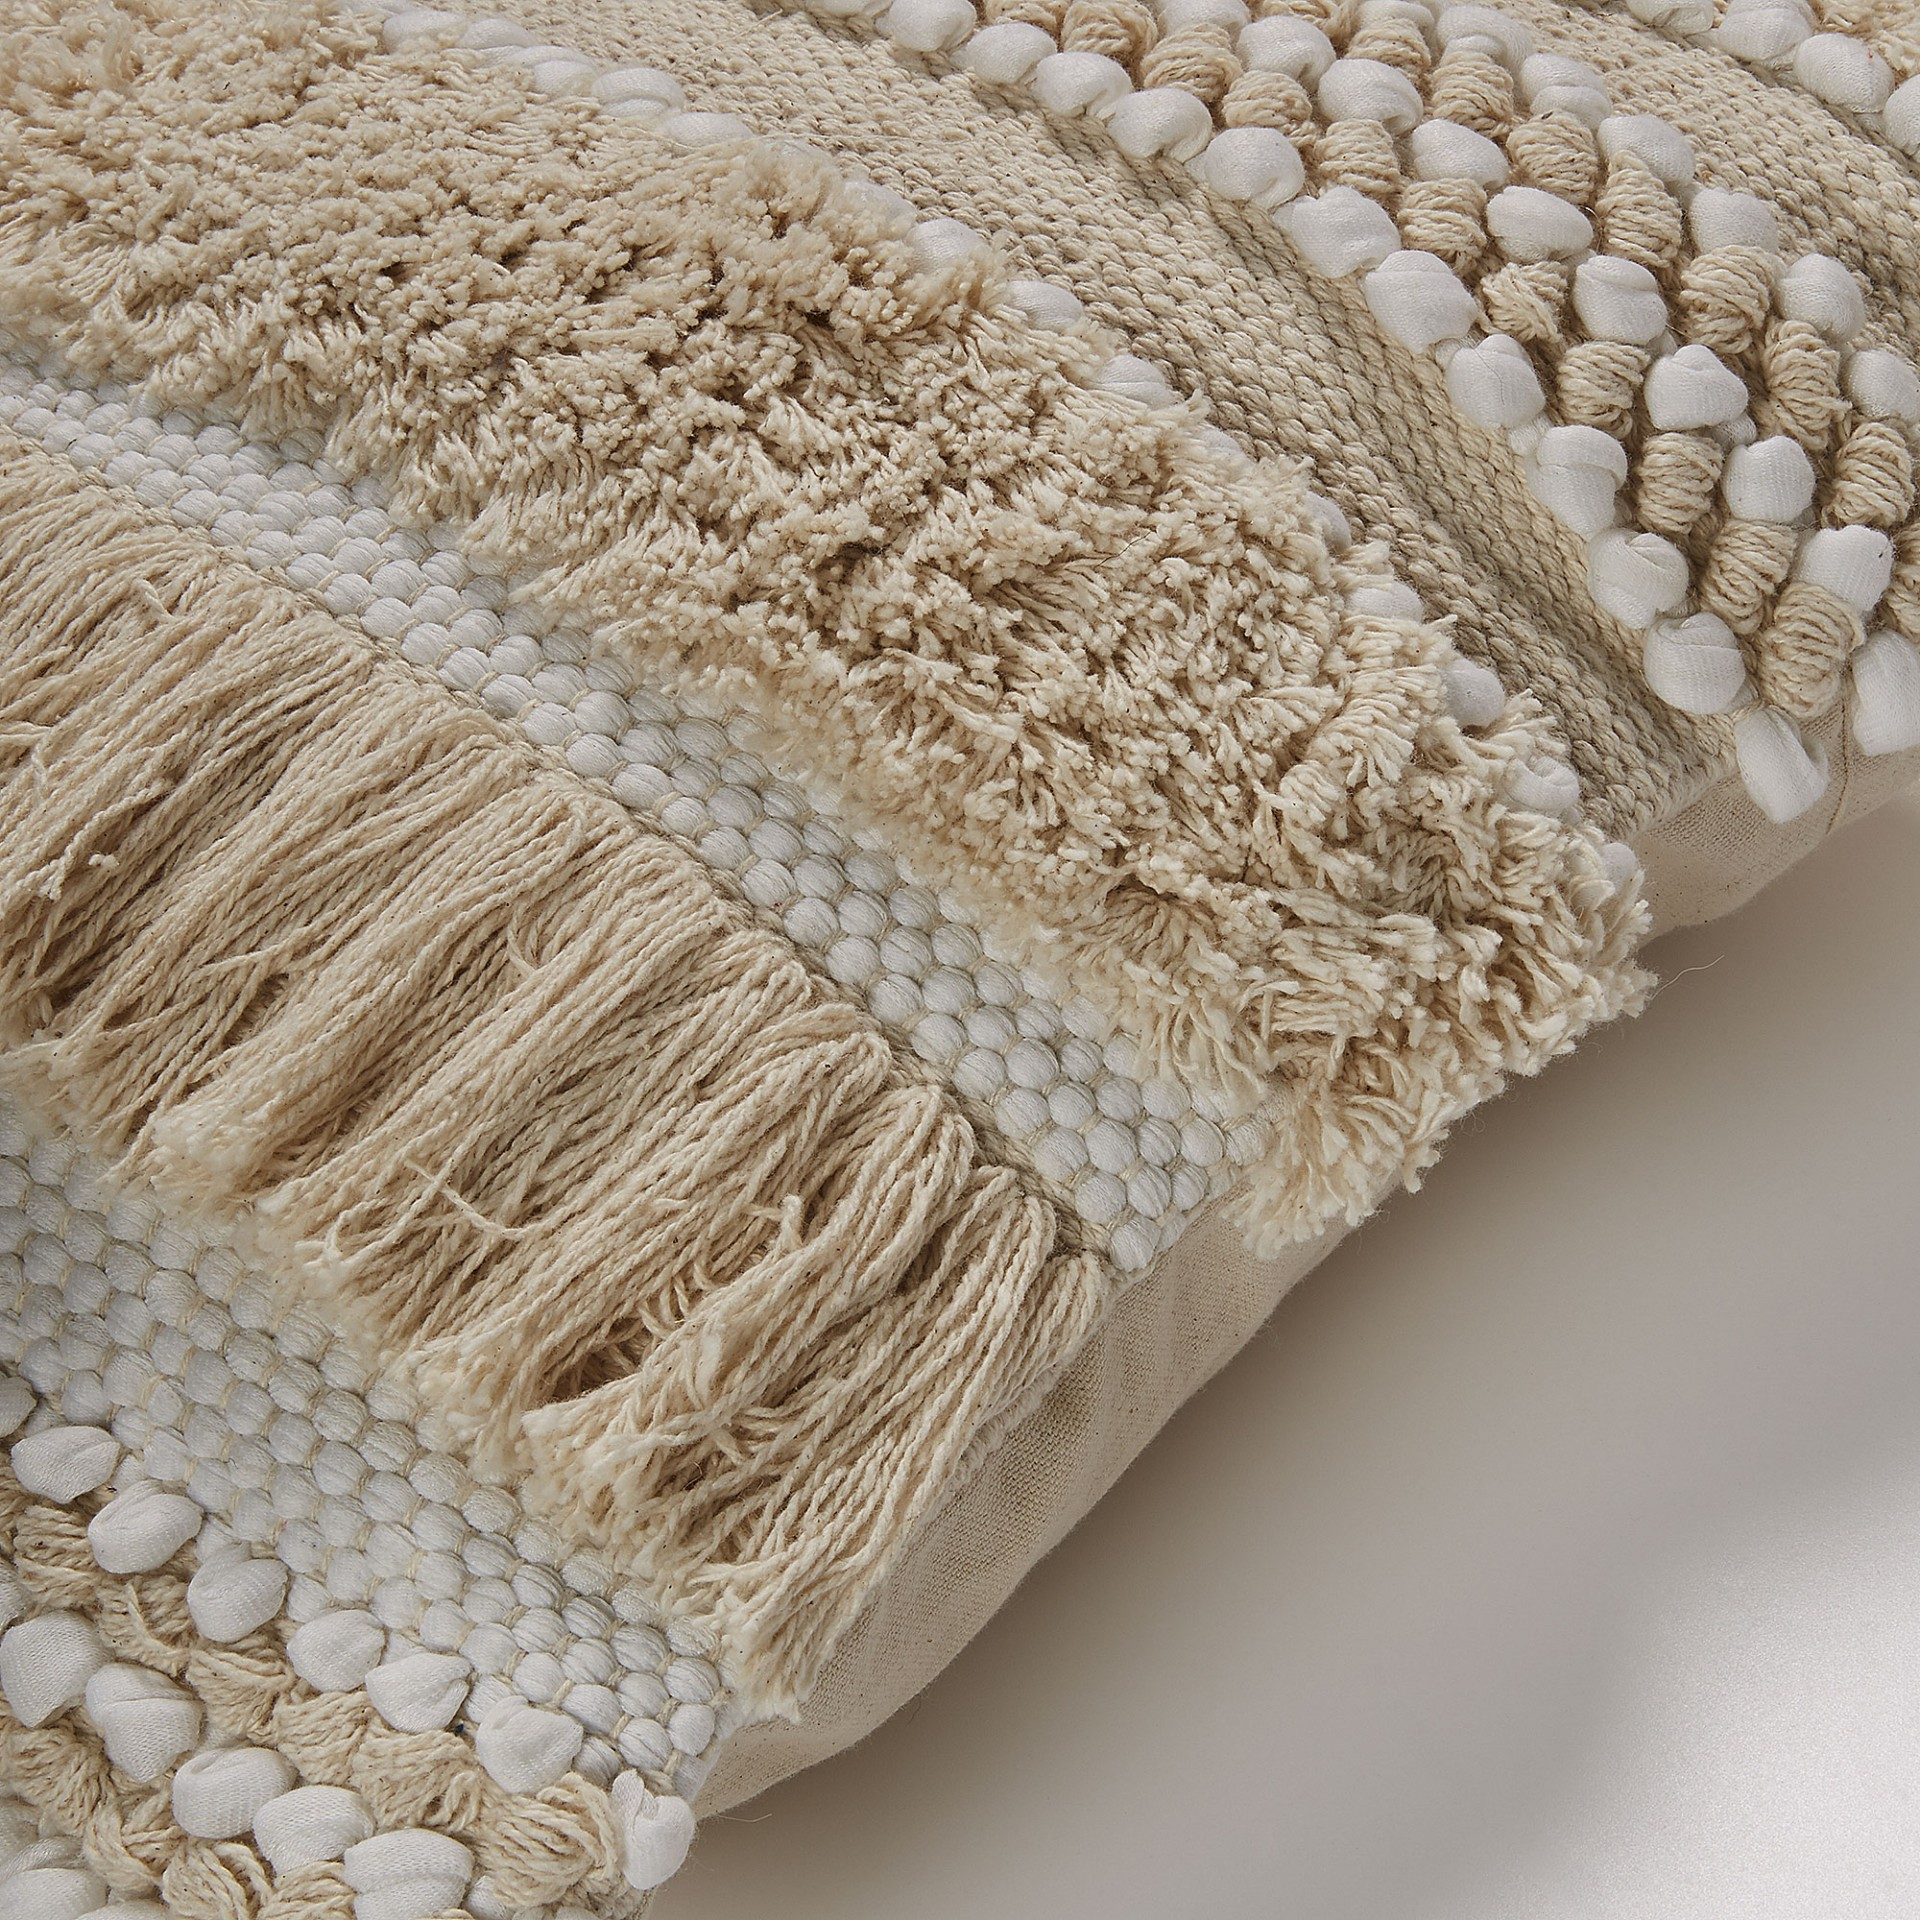 Capa de almofada Fyna, c/franjas, bege/branco, 45x45